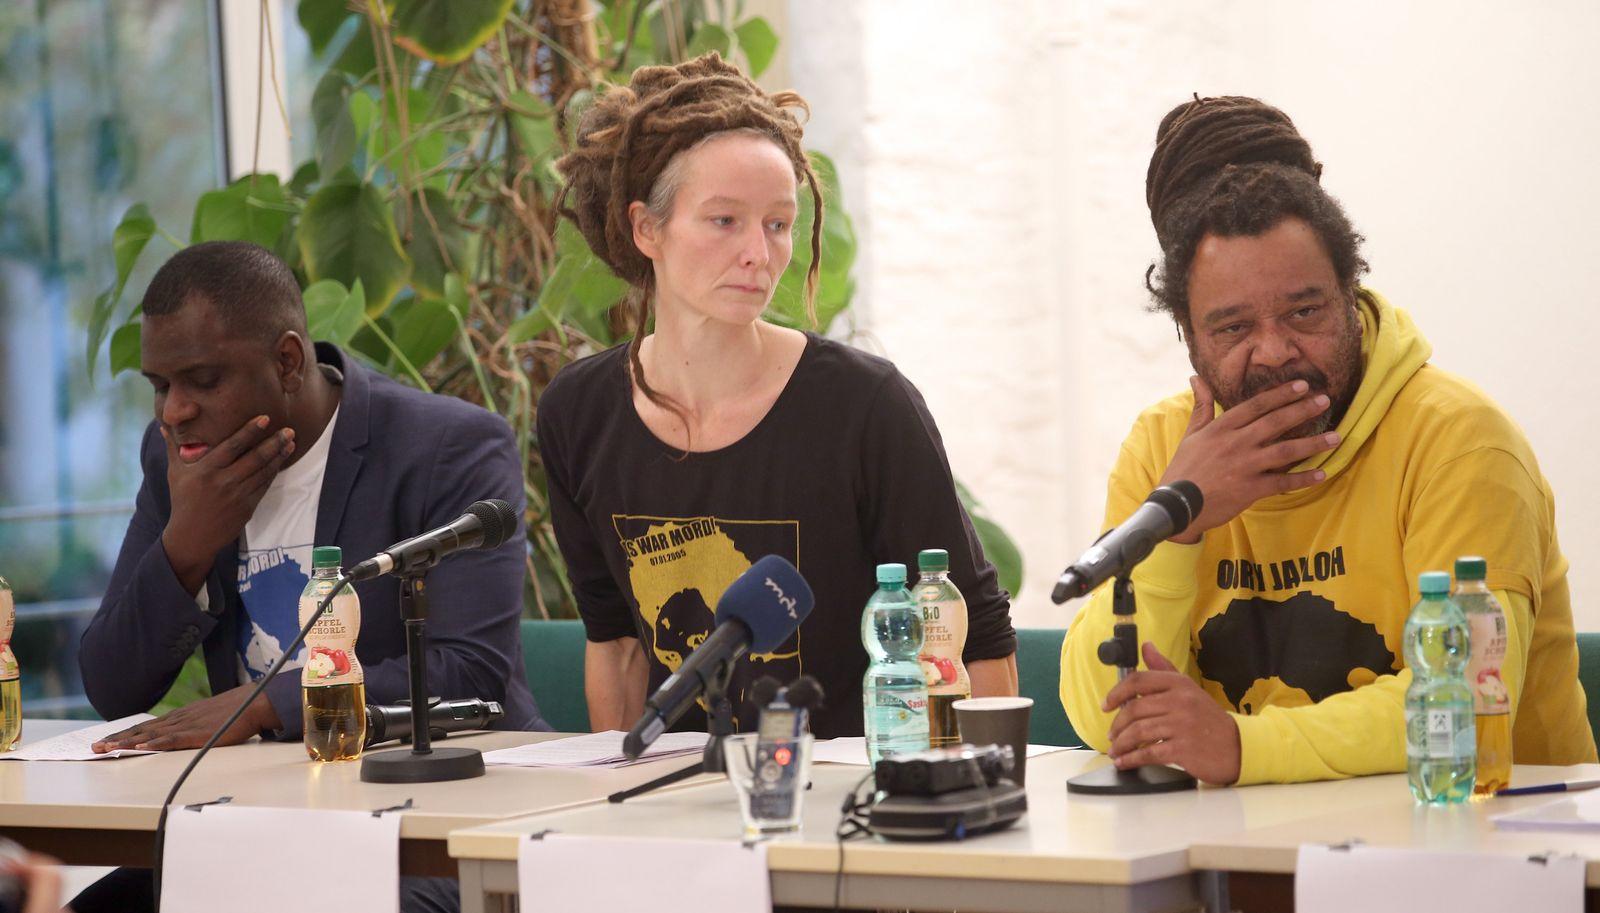 Oury Jalloh/ Pressekonferenz